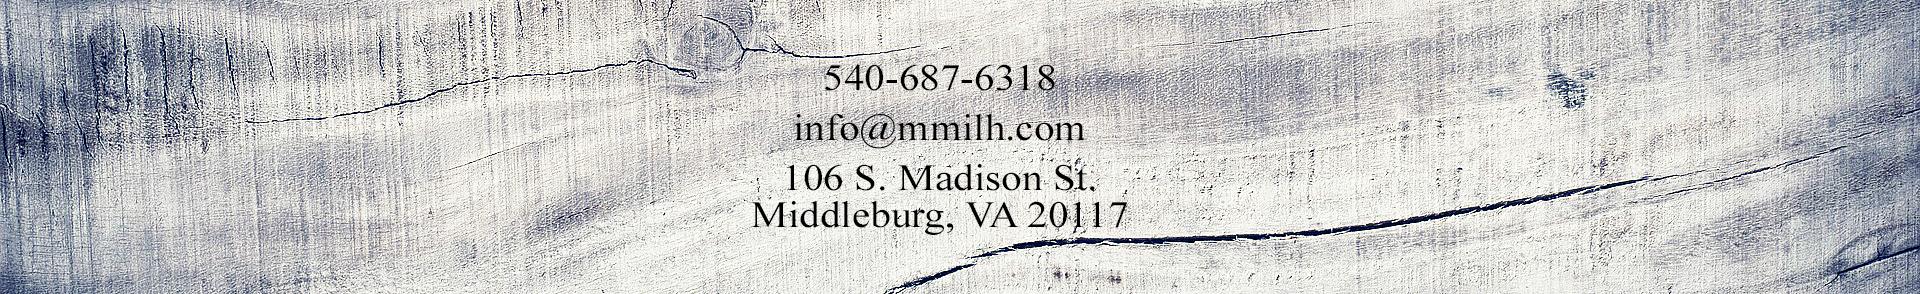 Middleburg Millwork